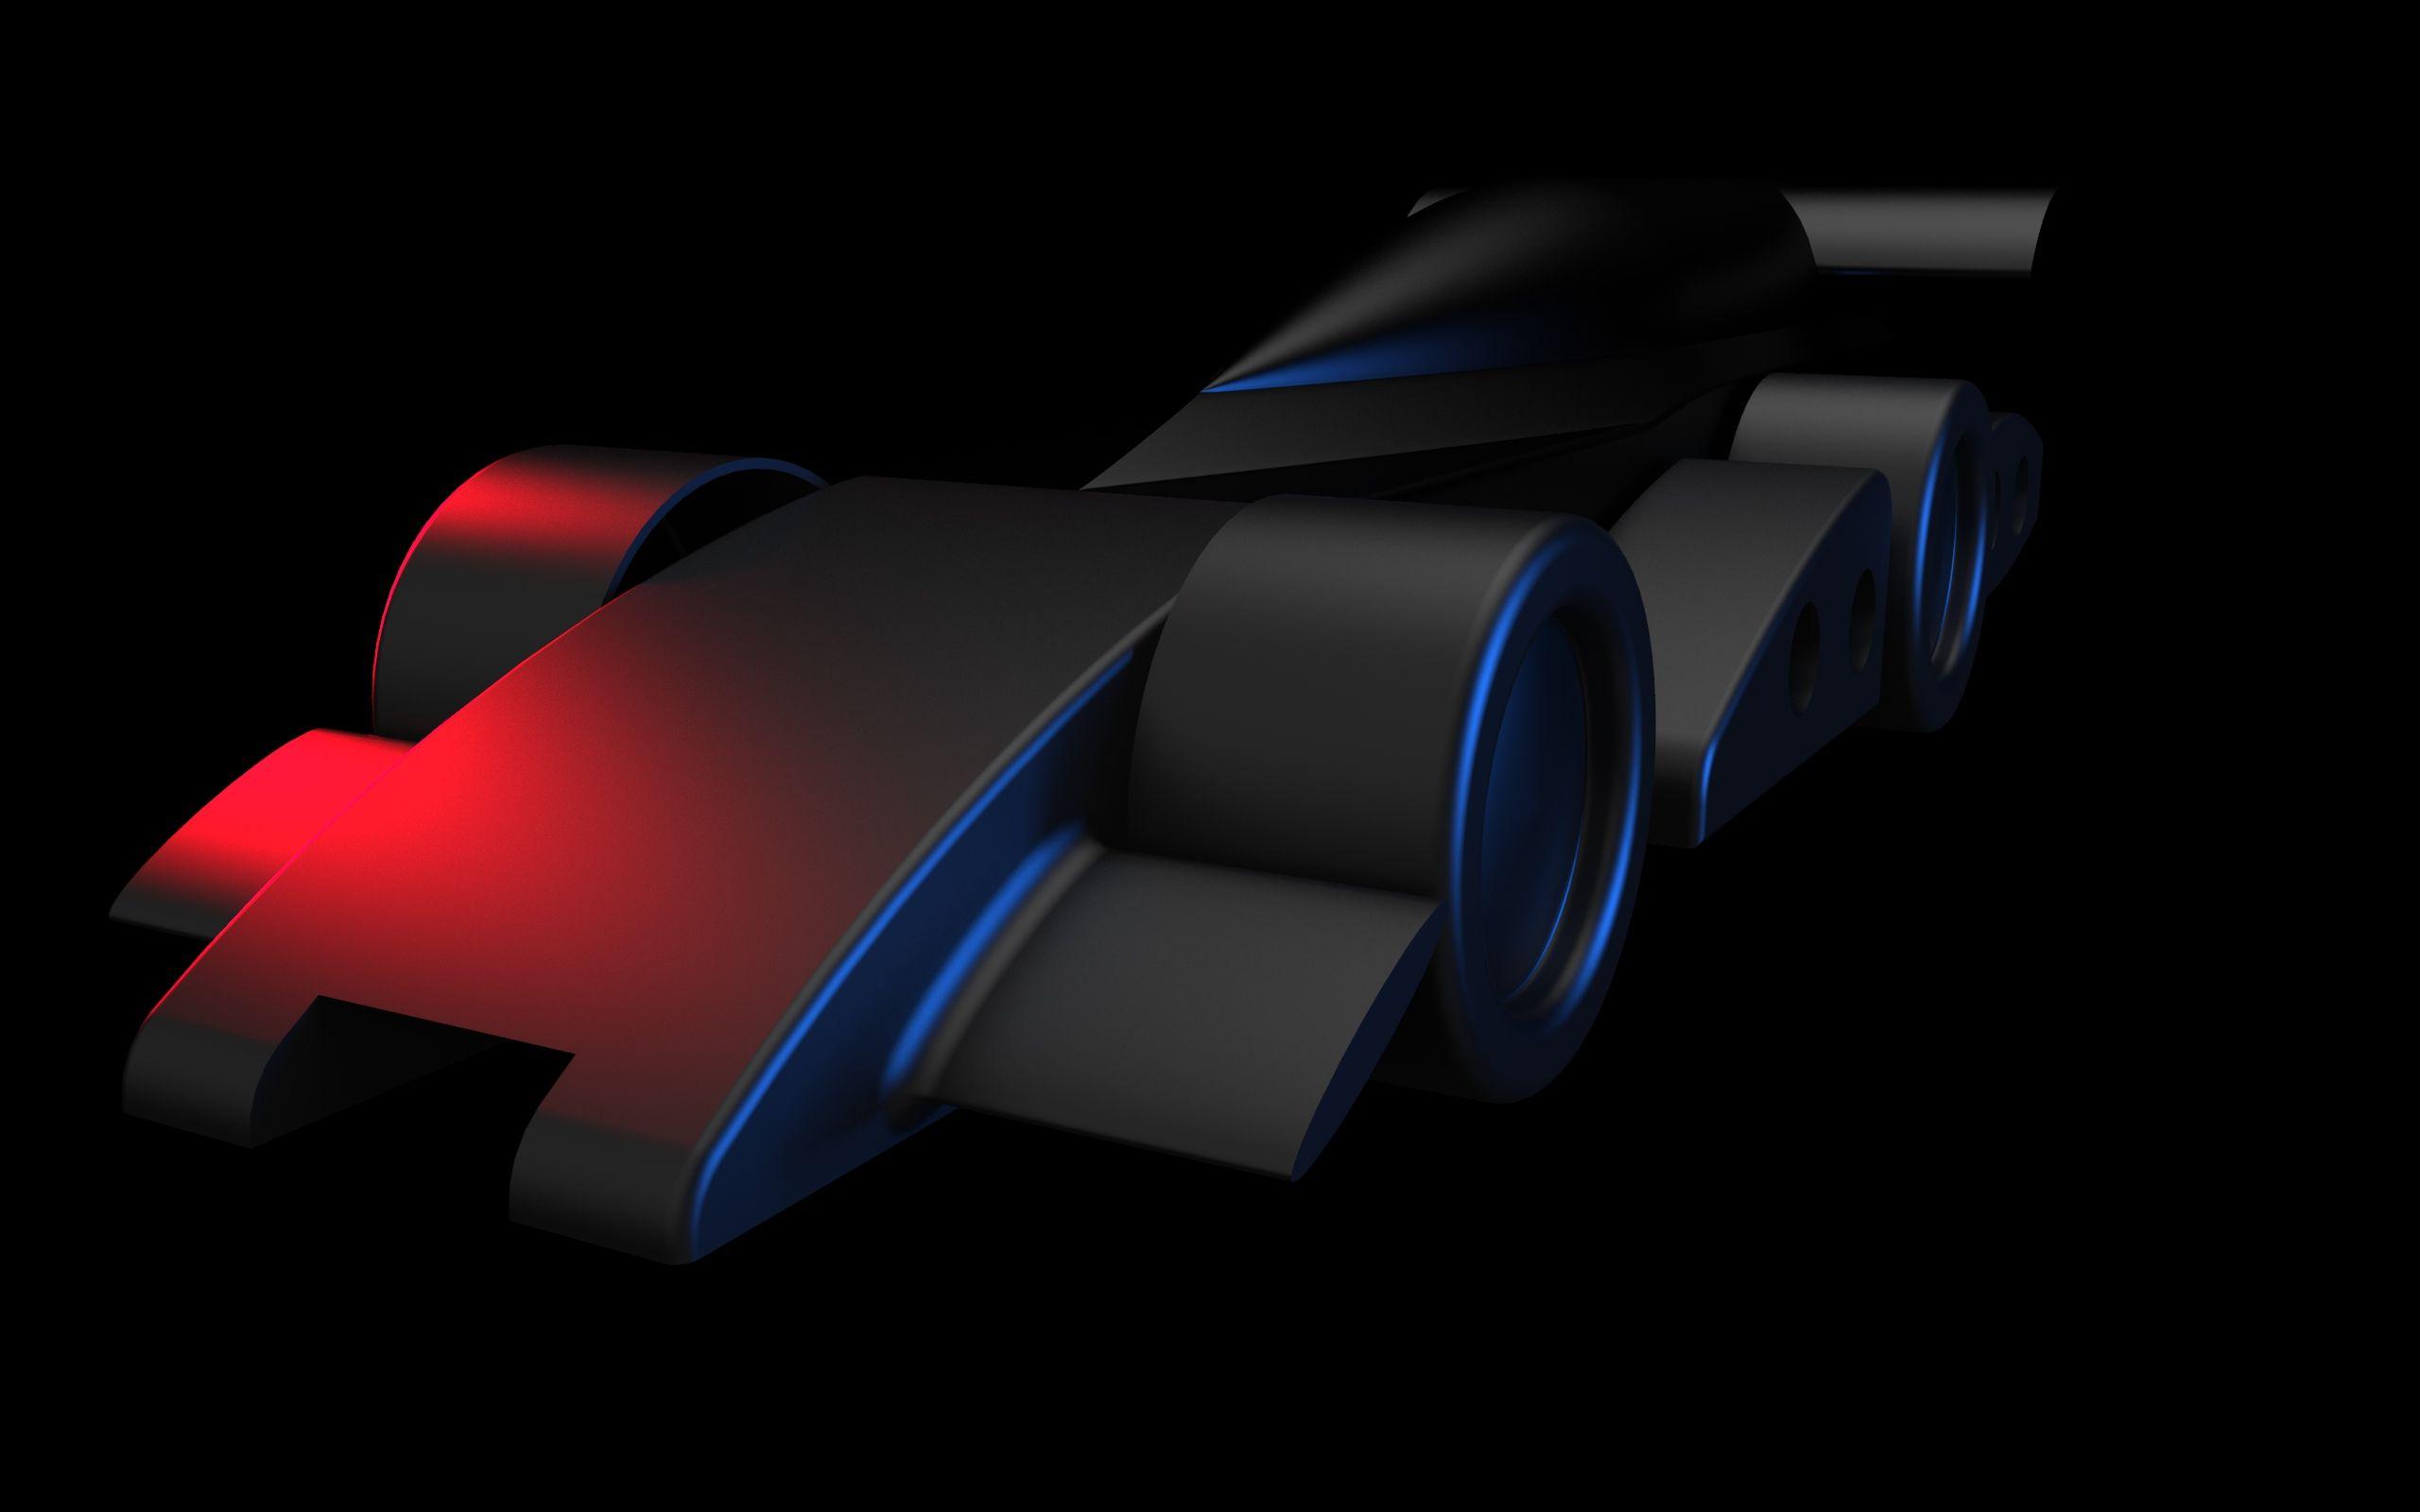 F1---fabrica-de-nerdes-design-lcs2019-3500-3500